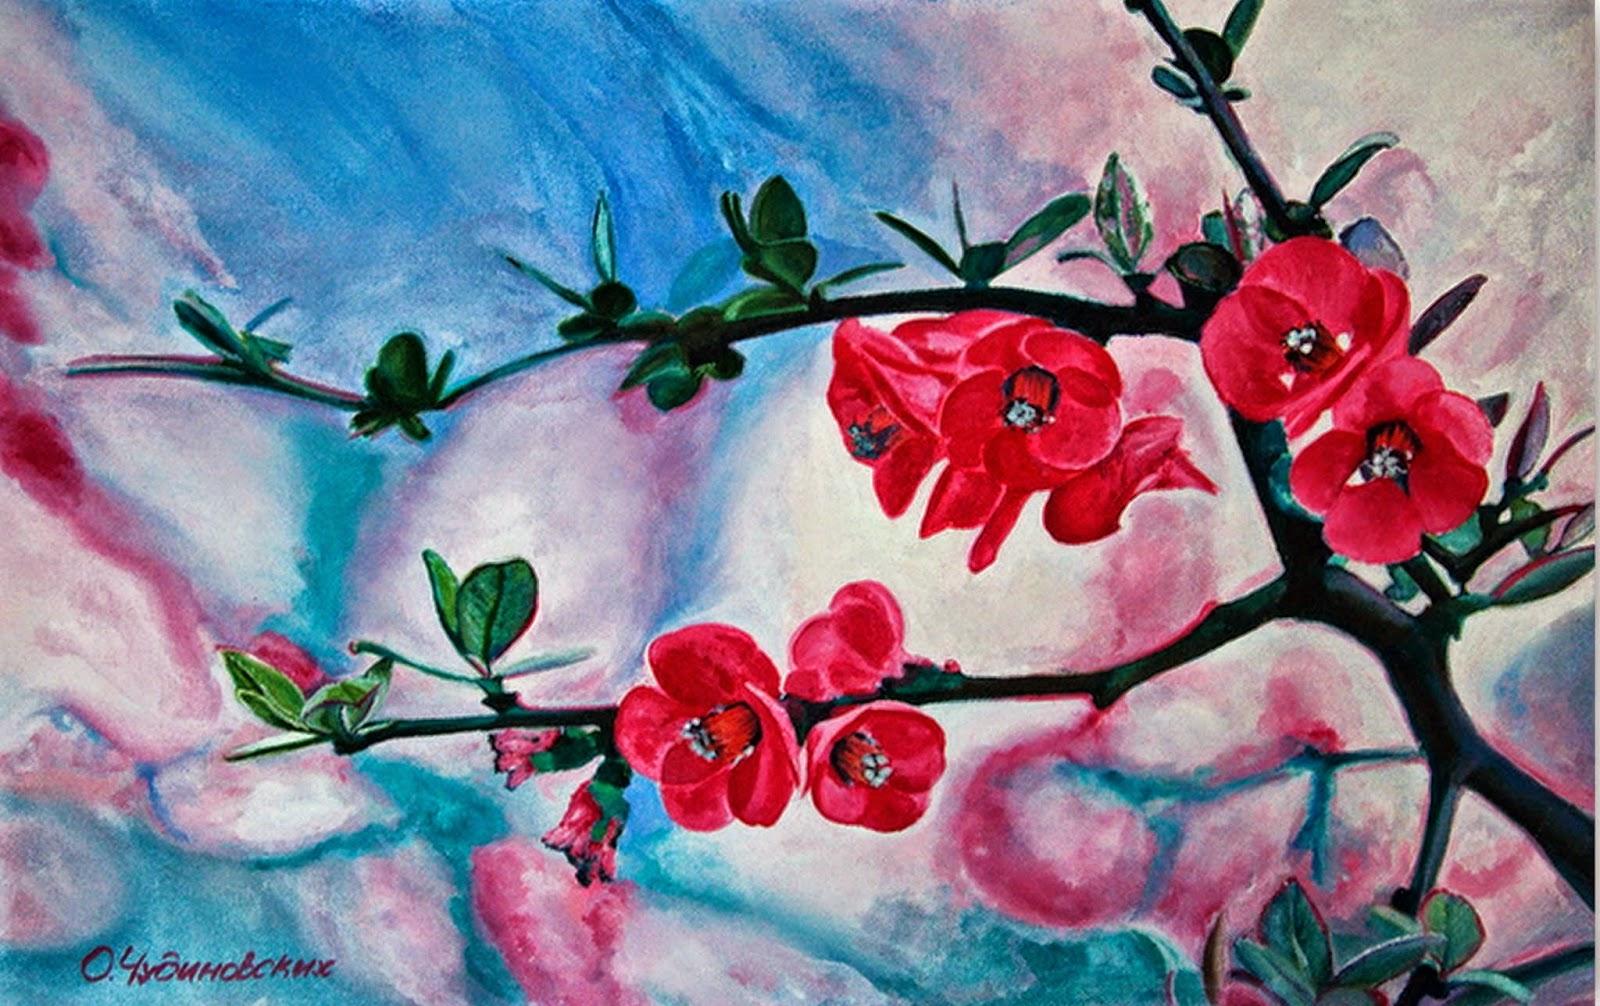 Im genes arte pinturas ideas para pintar cuadros de - Ideas para pintar cuadros ...